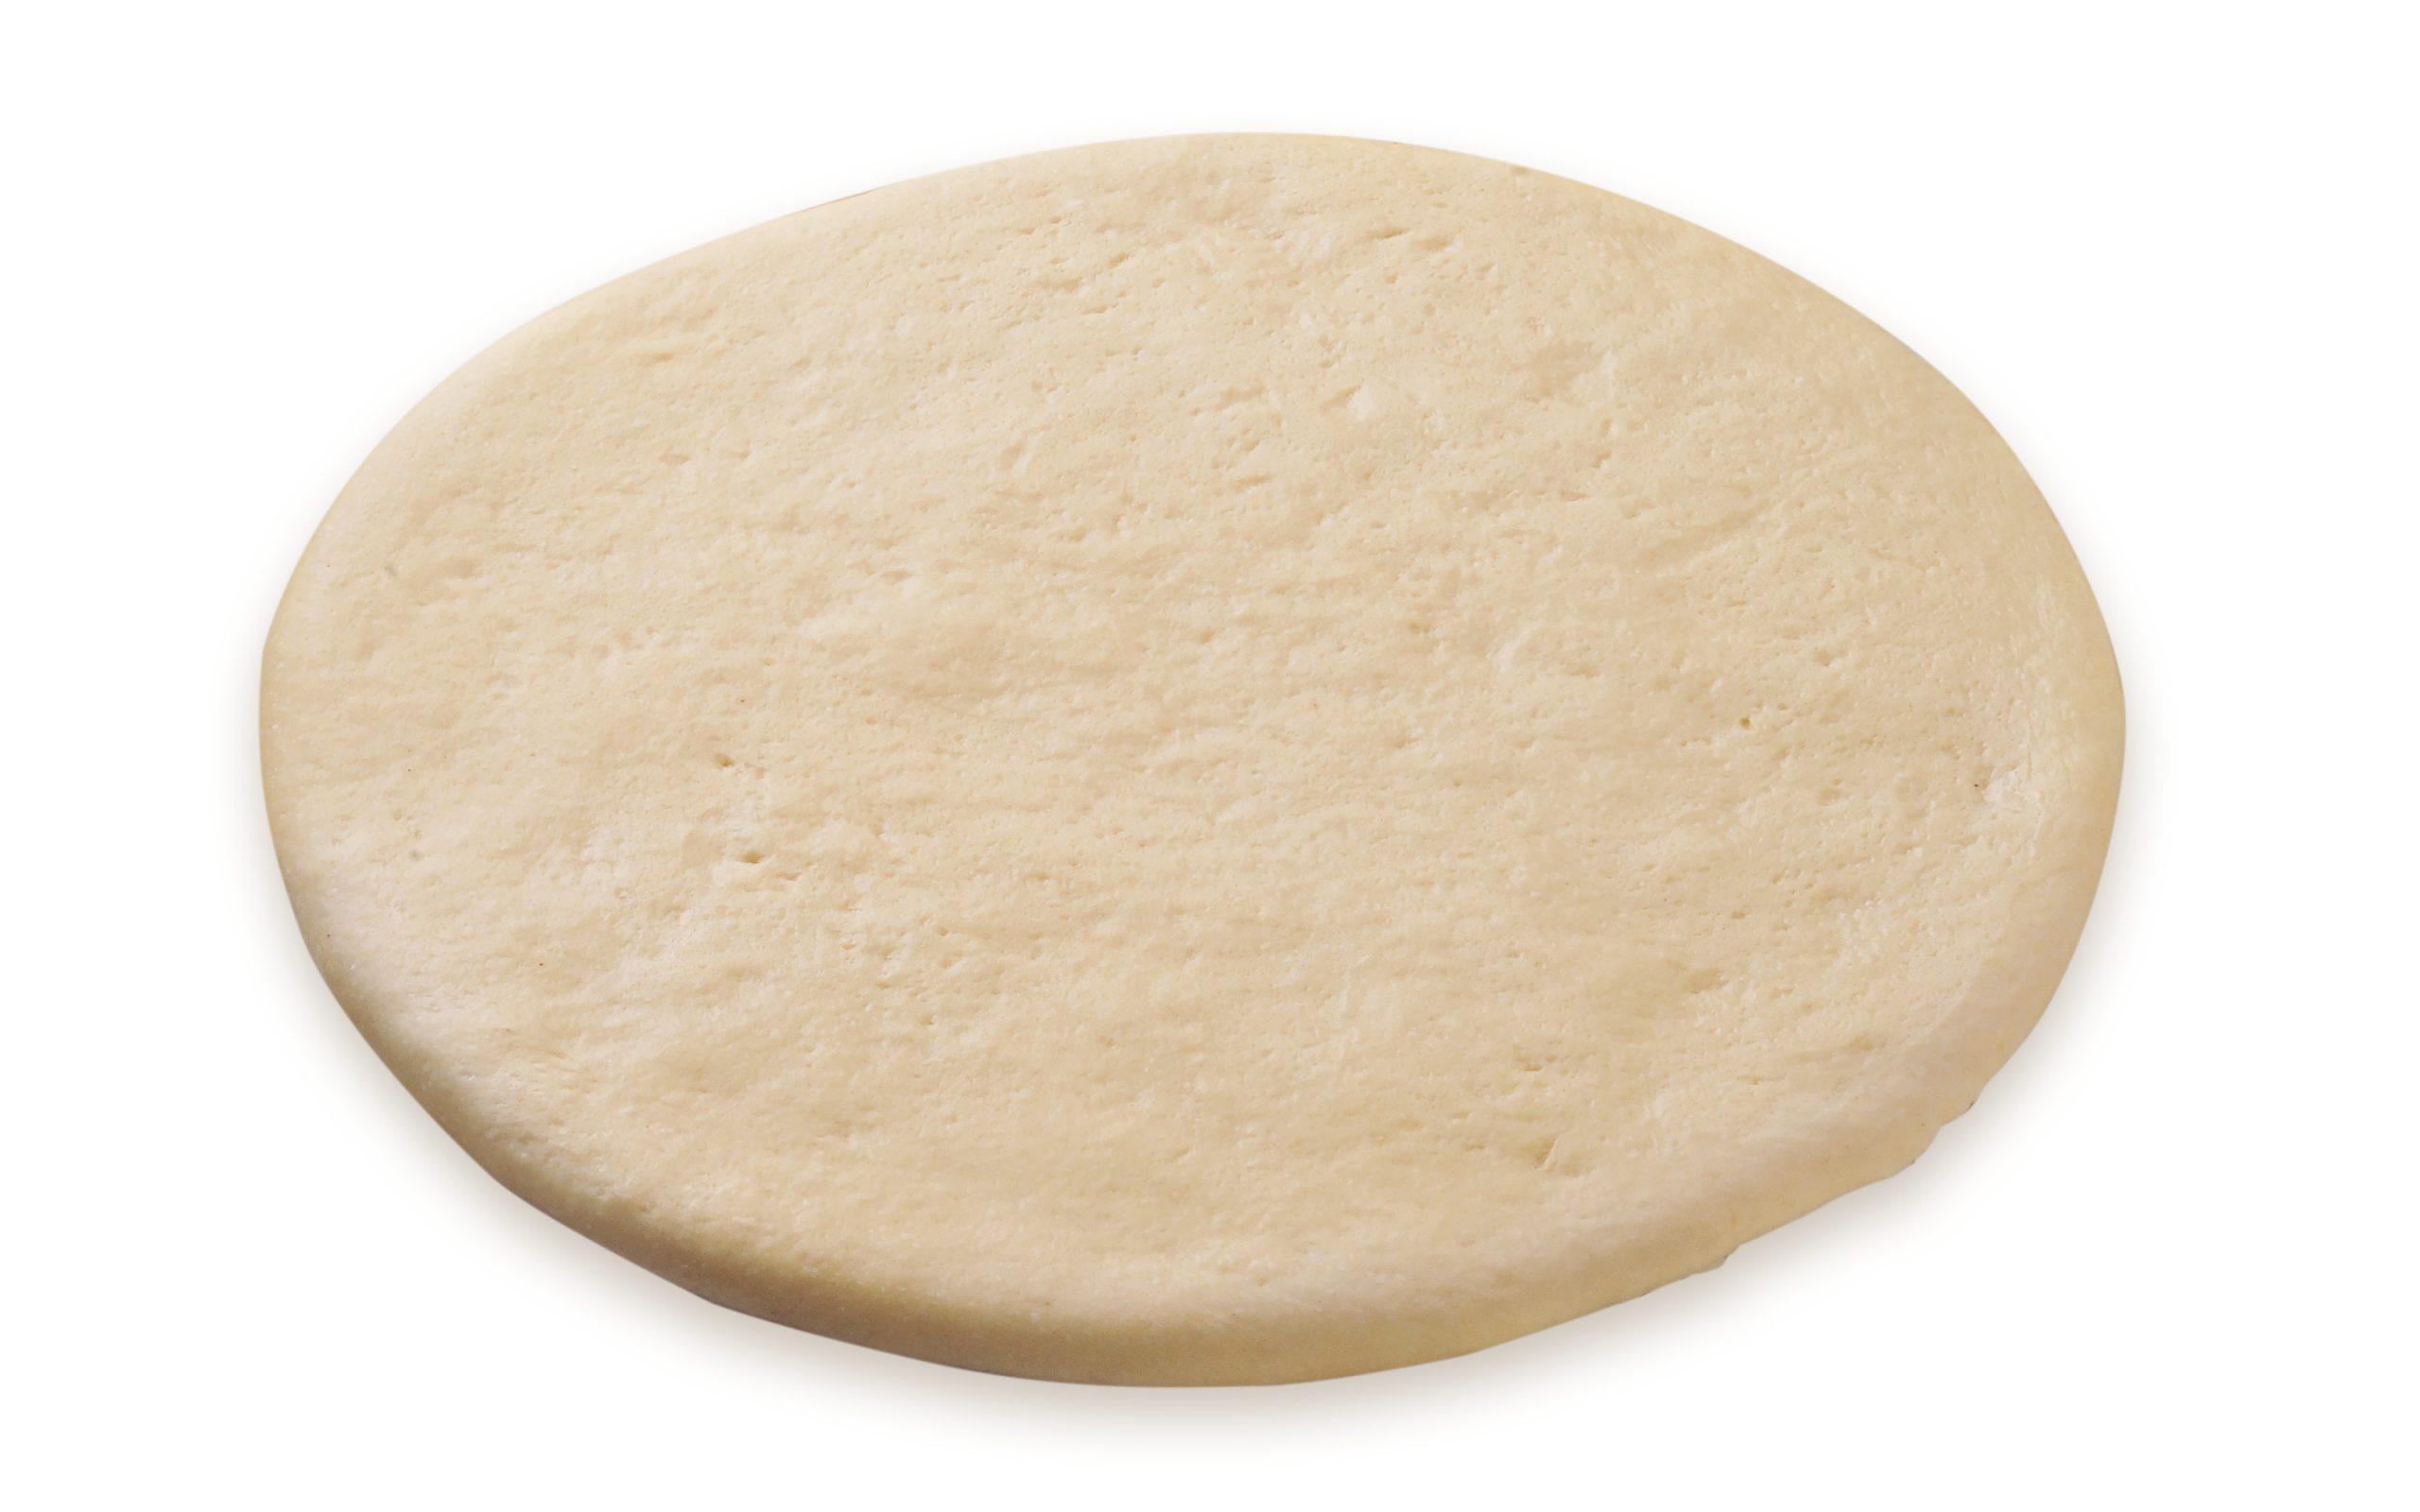 Chickpea dough